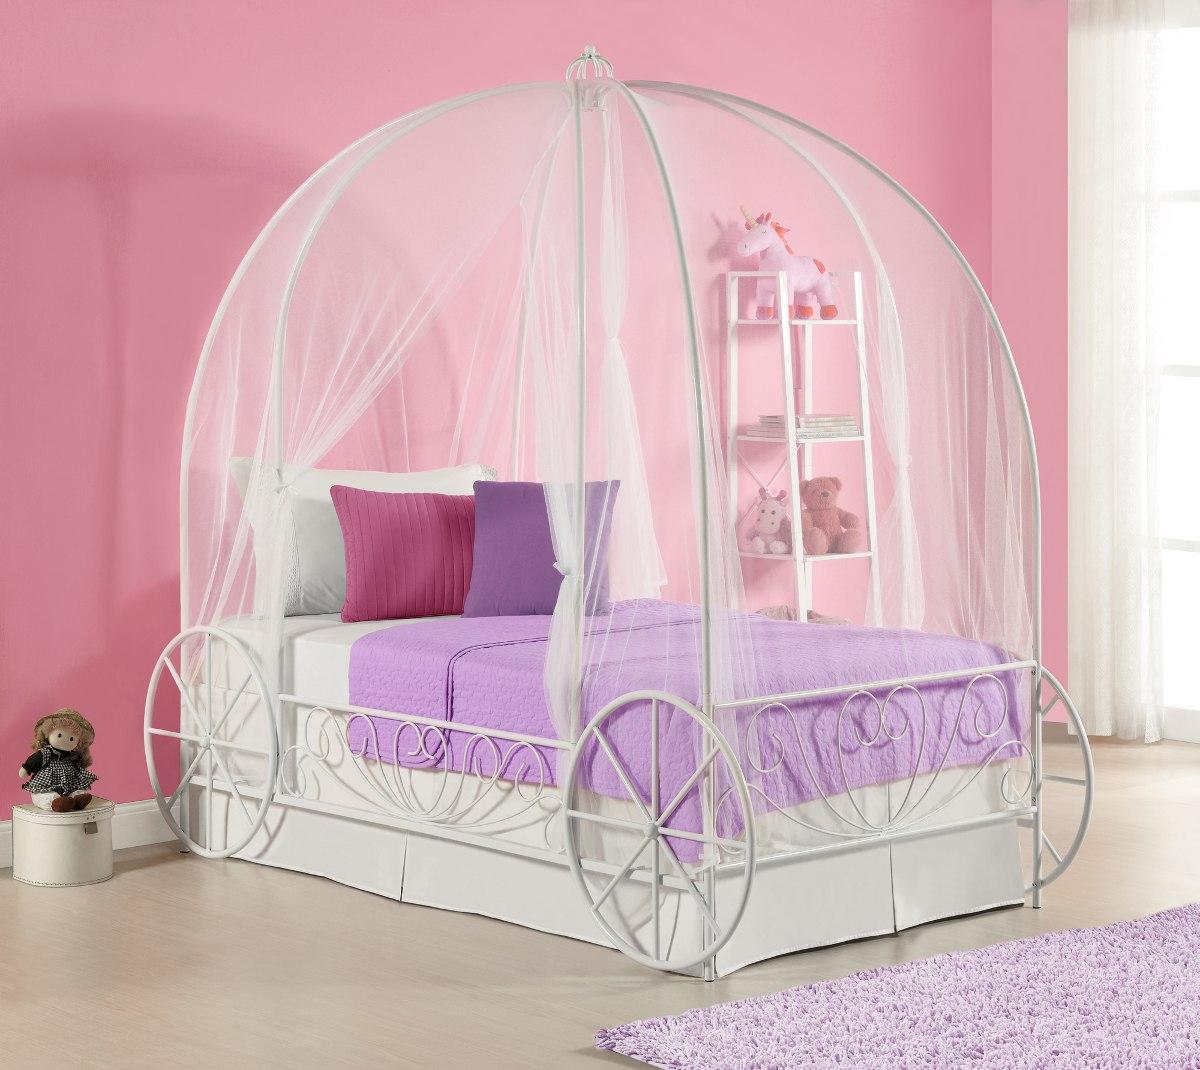 Recamara cama individual disney cenicienta carruaje ni a for Muebles para recamara de nina